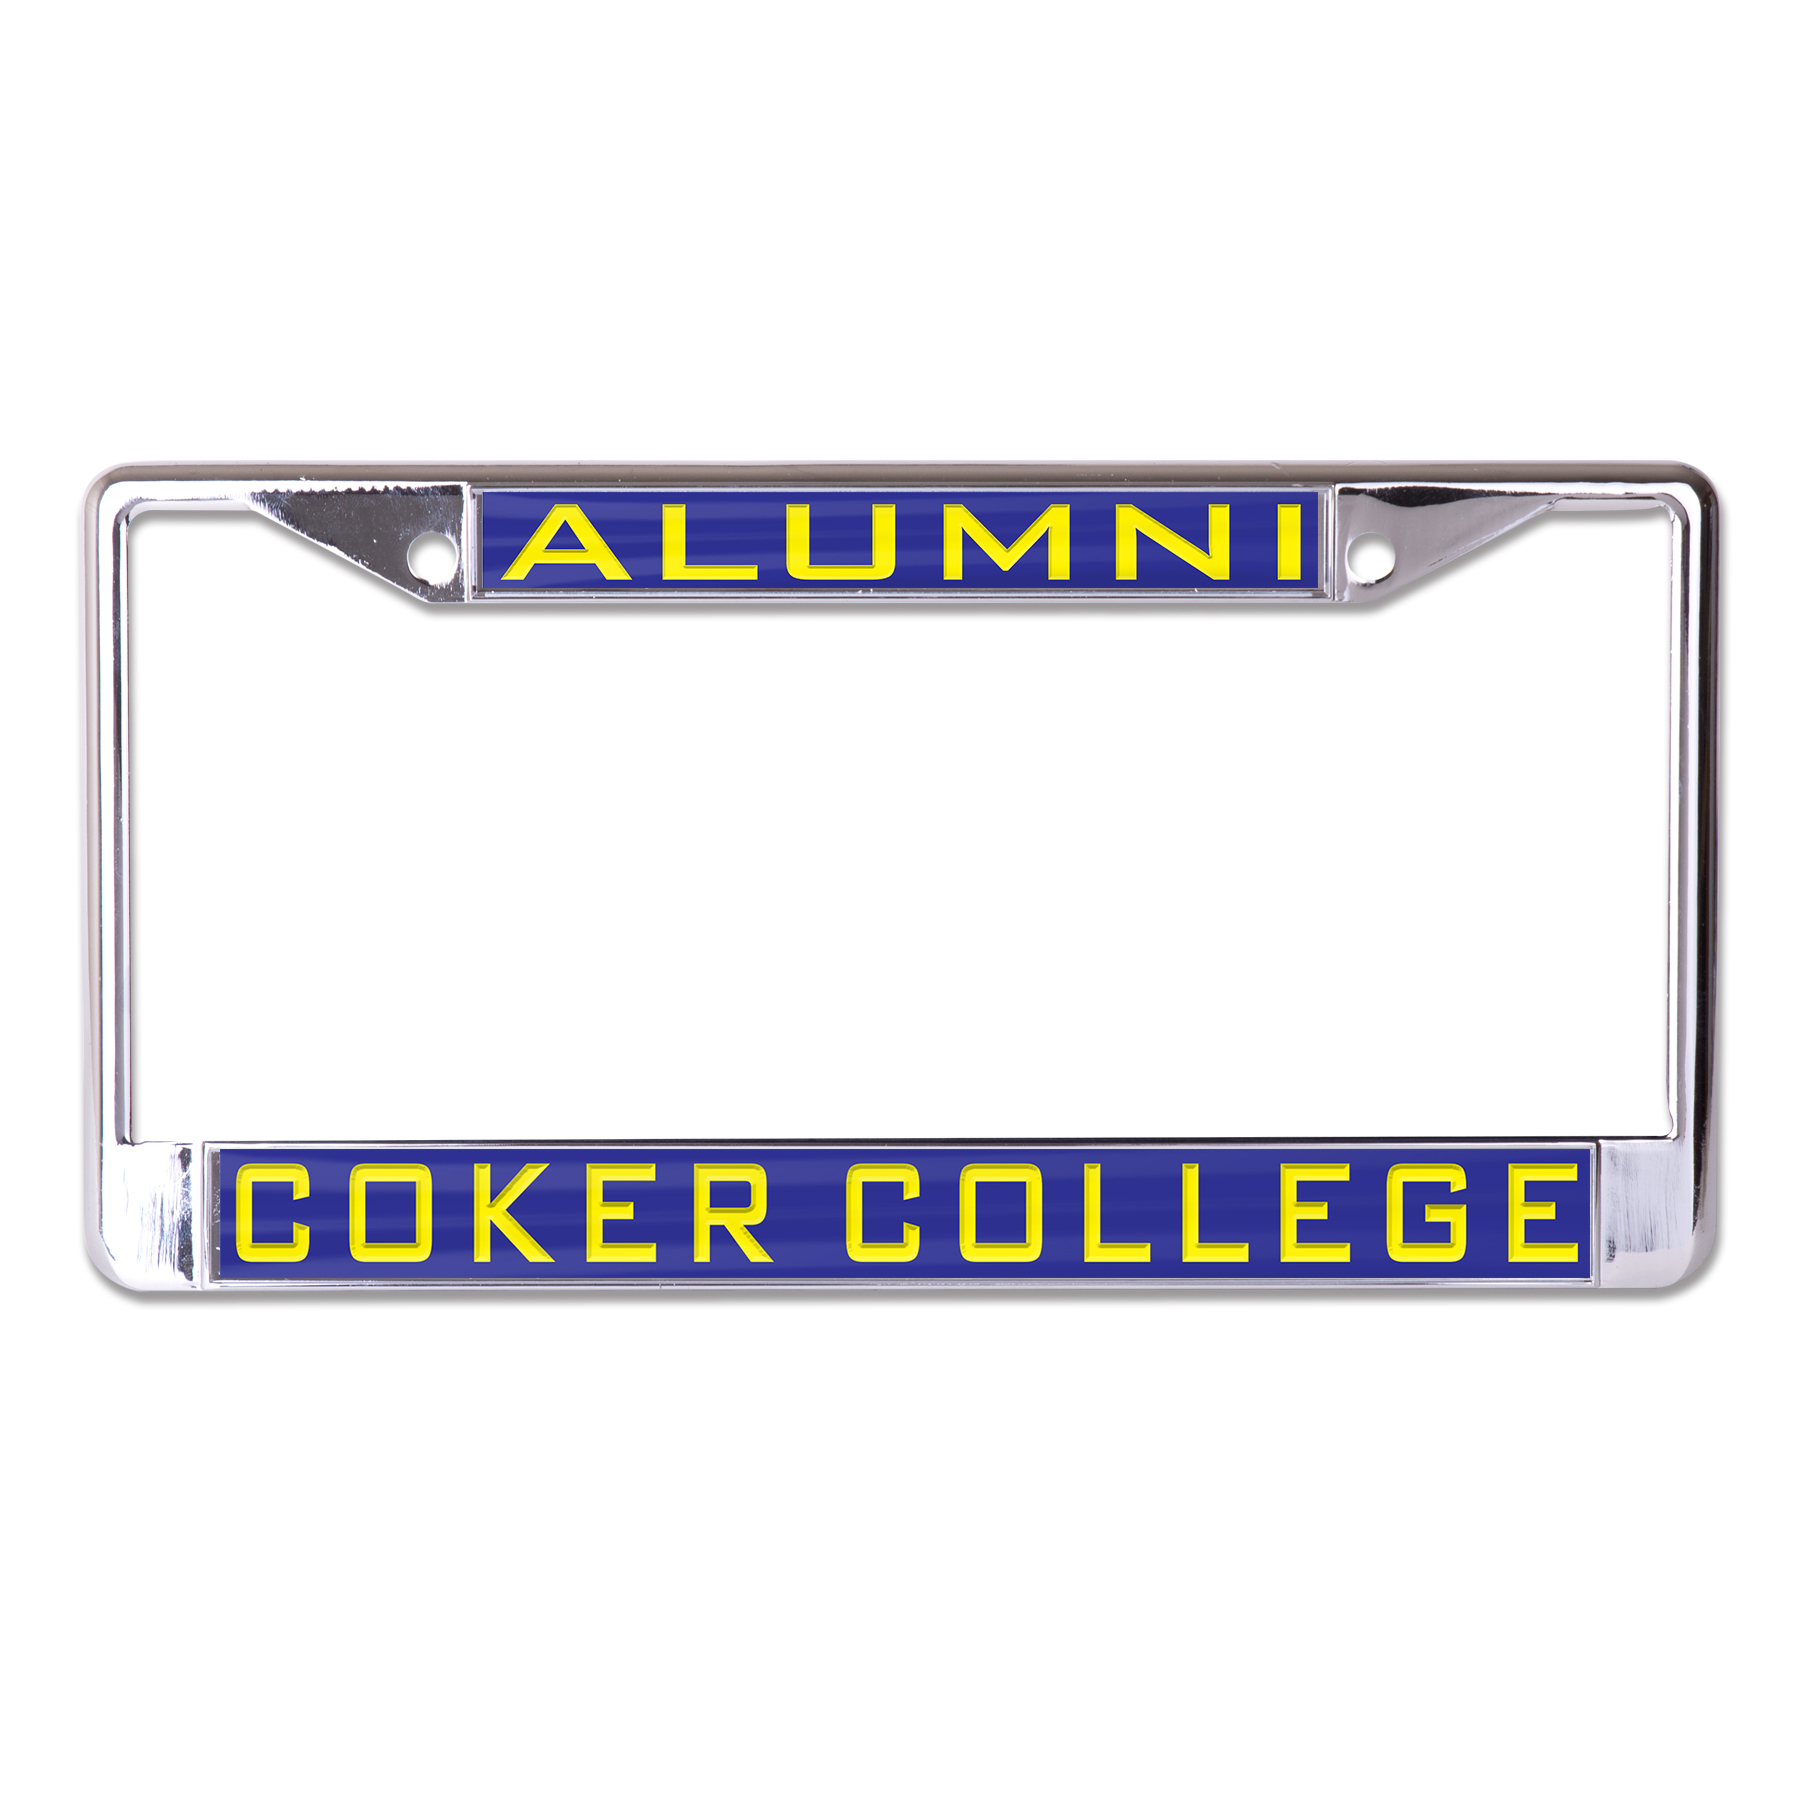 Souvenir Alumni ALUMNI COKER COLLEGE INLAID LICENSE FRAME